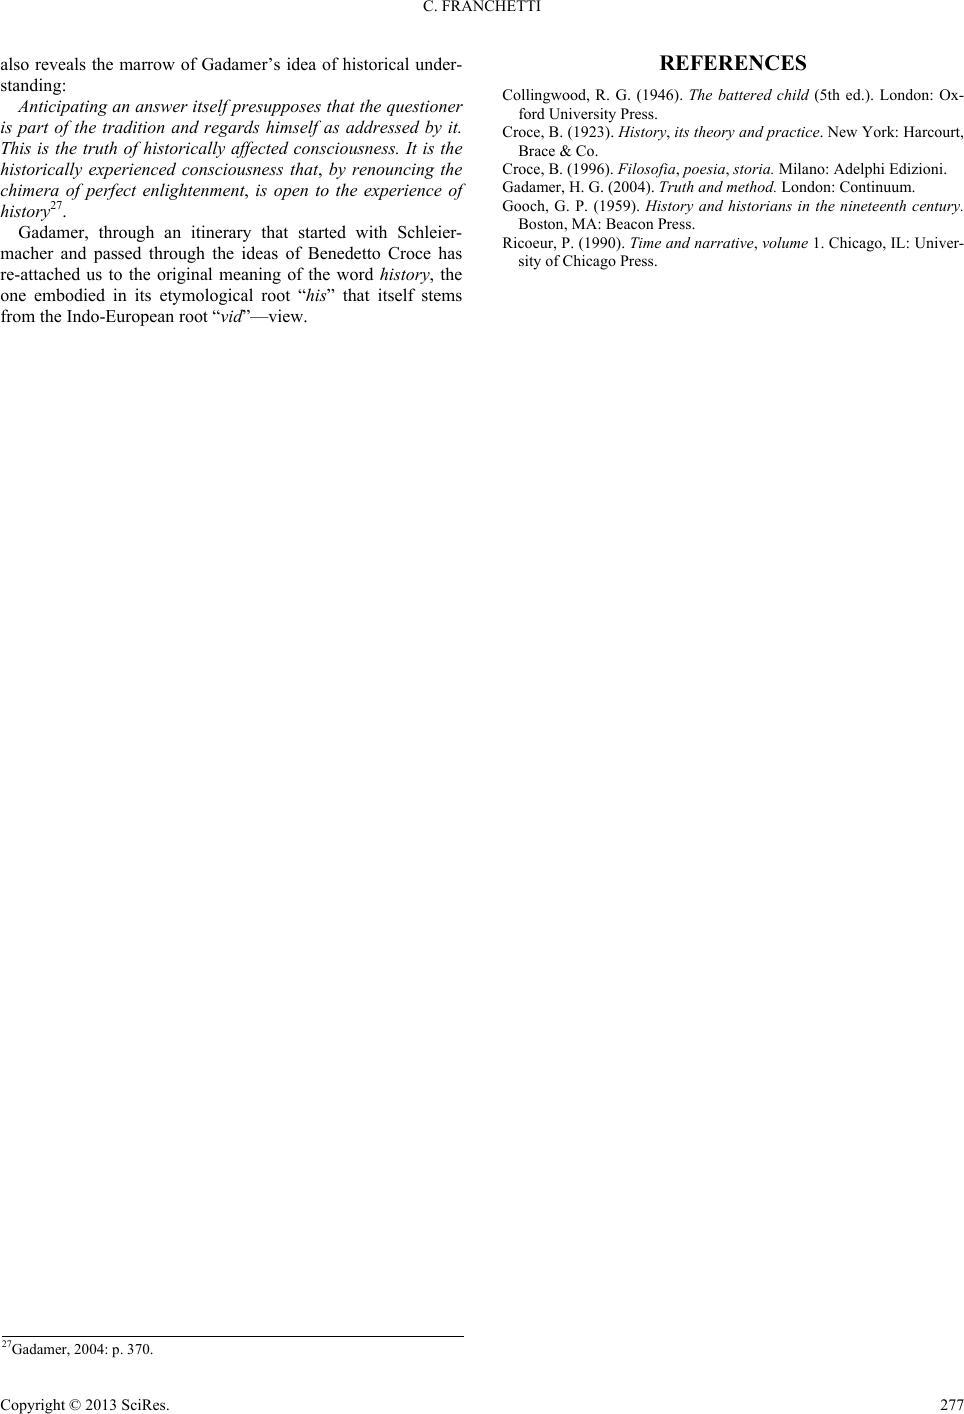 analysing dasein according to heidegger philosophy essay 2015-3-23 phenomenology in the heideggerian sense philosophy essay  by using the word dasein, heidegger showed that dasein is  according to heidegger, dasein.